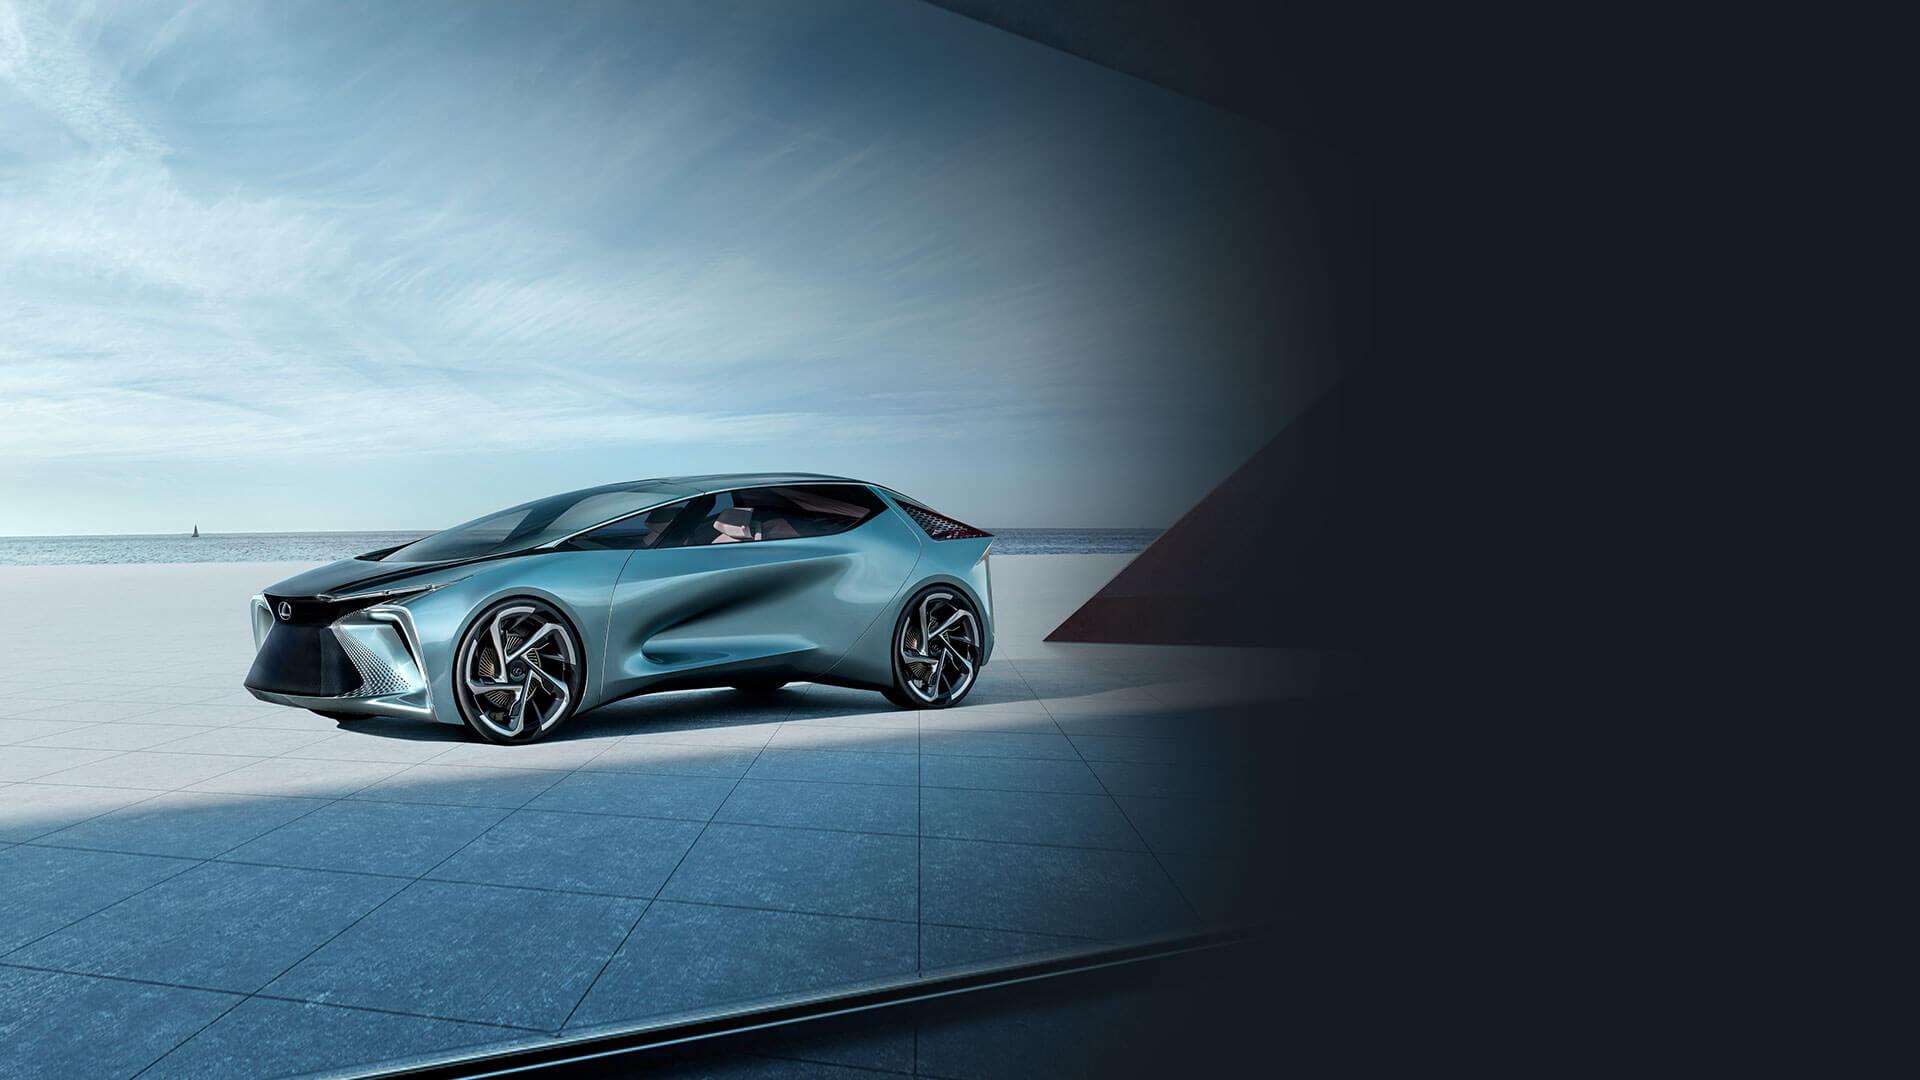 03 LF 30 Concept Car Hero Image